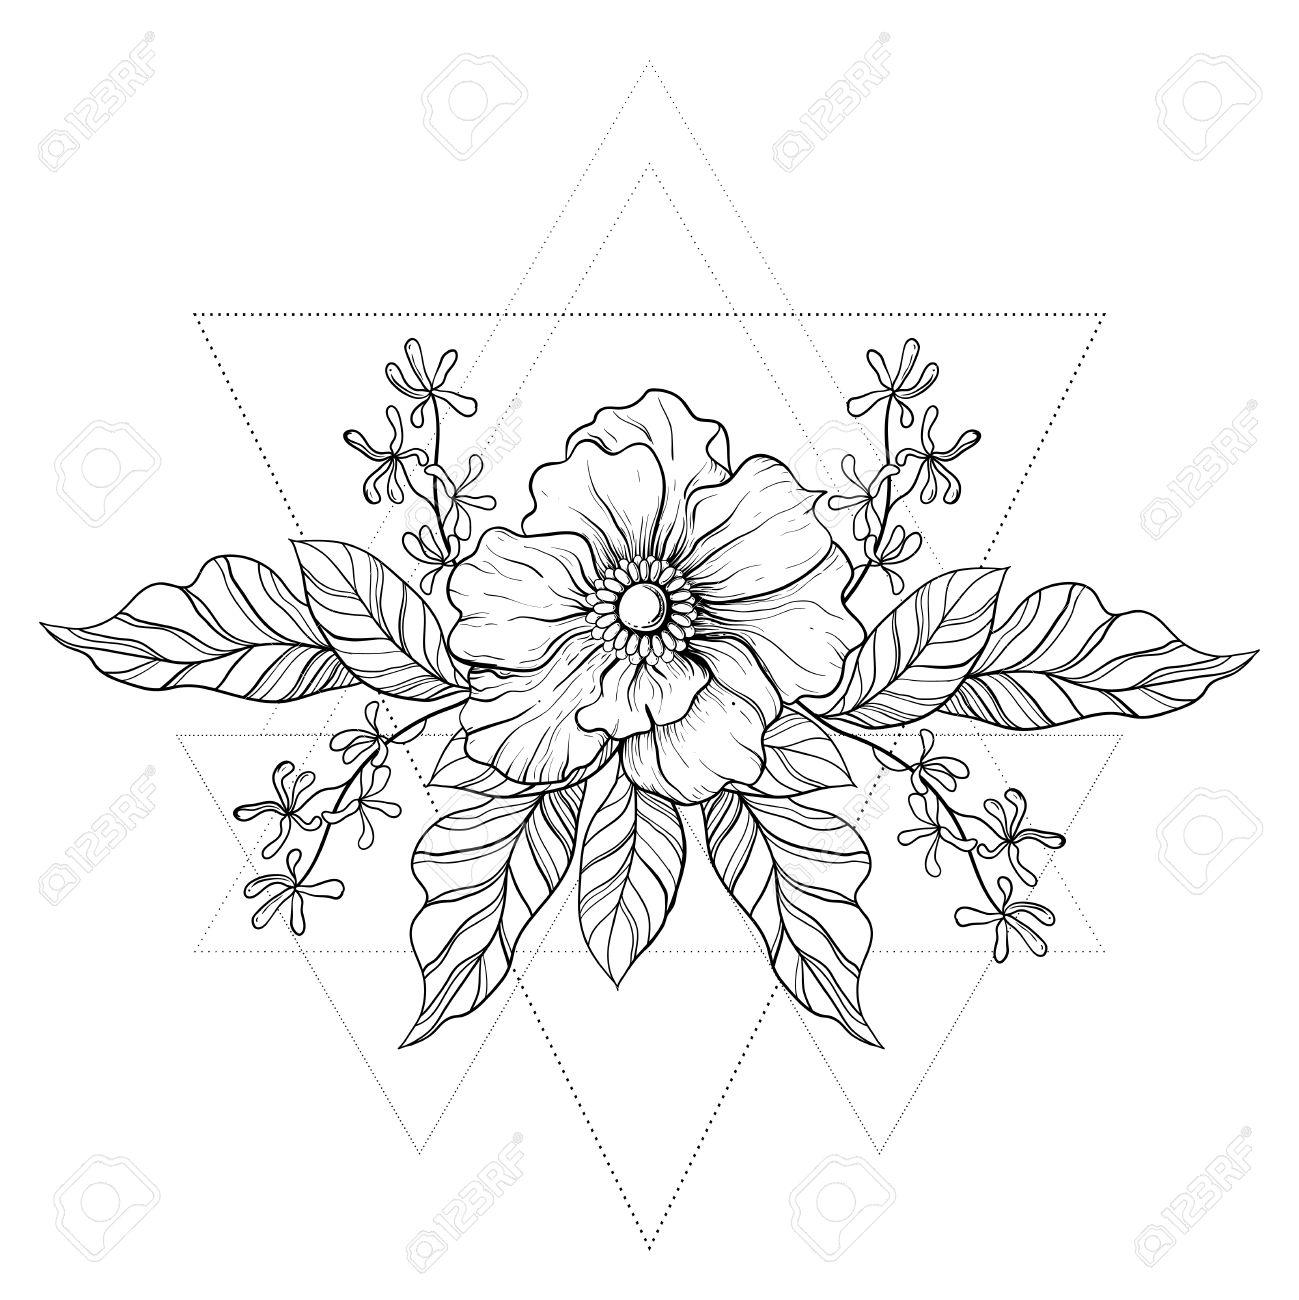 Dibujado A Mano Tatuaje Boho. Blackwork Flor En Marco Triángulos ...